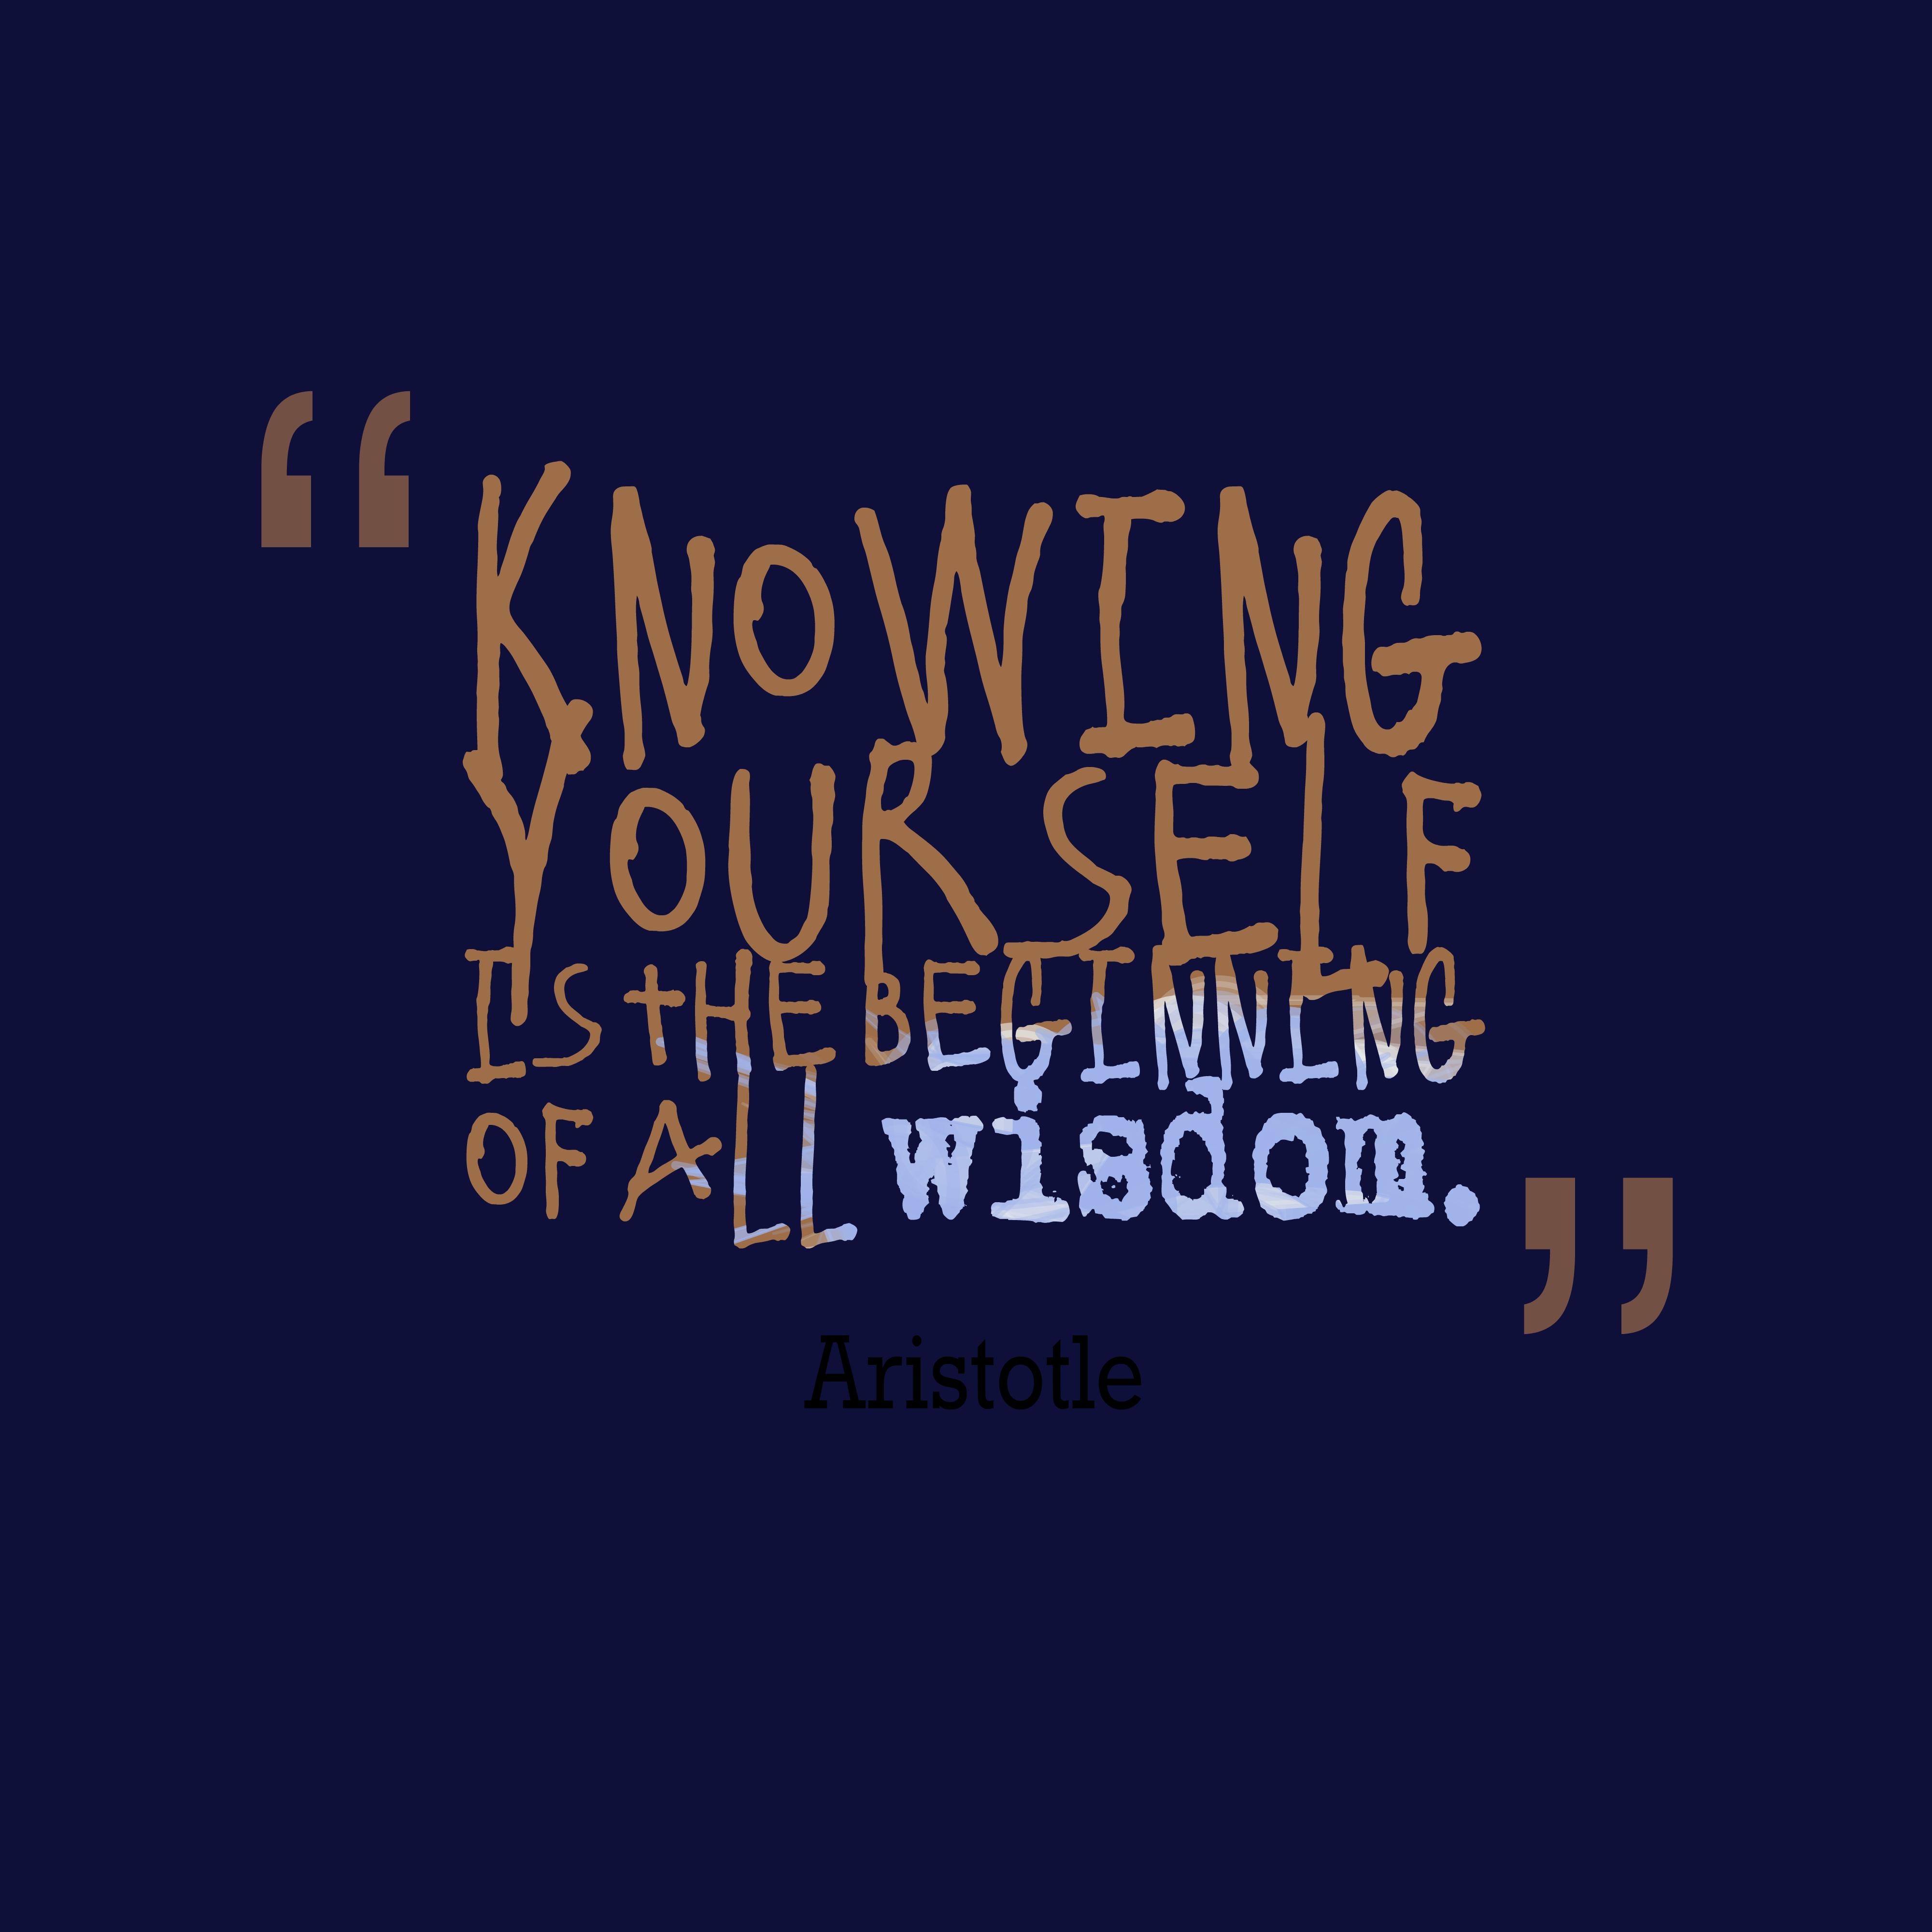 Aristotle Quote About Wisdom